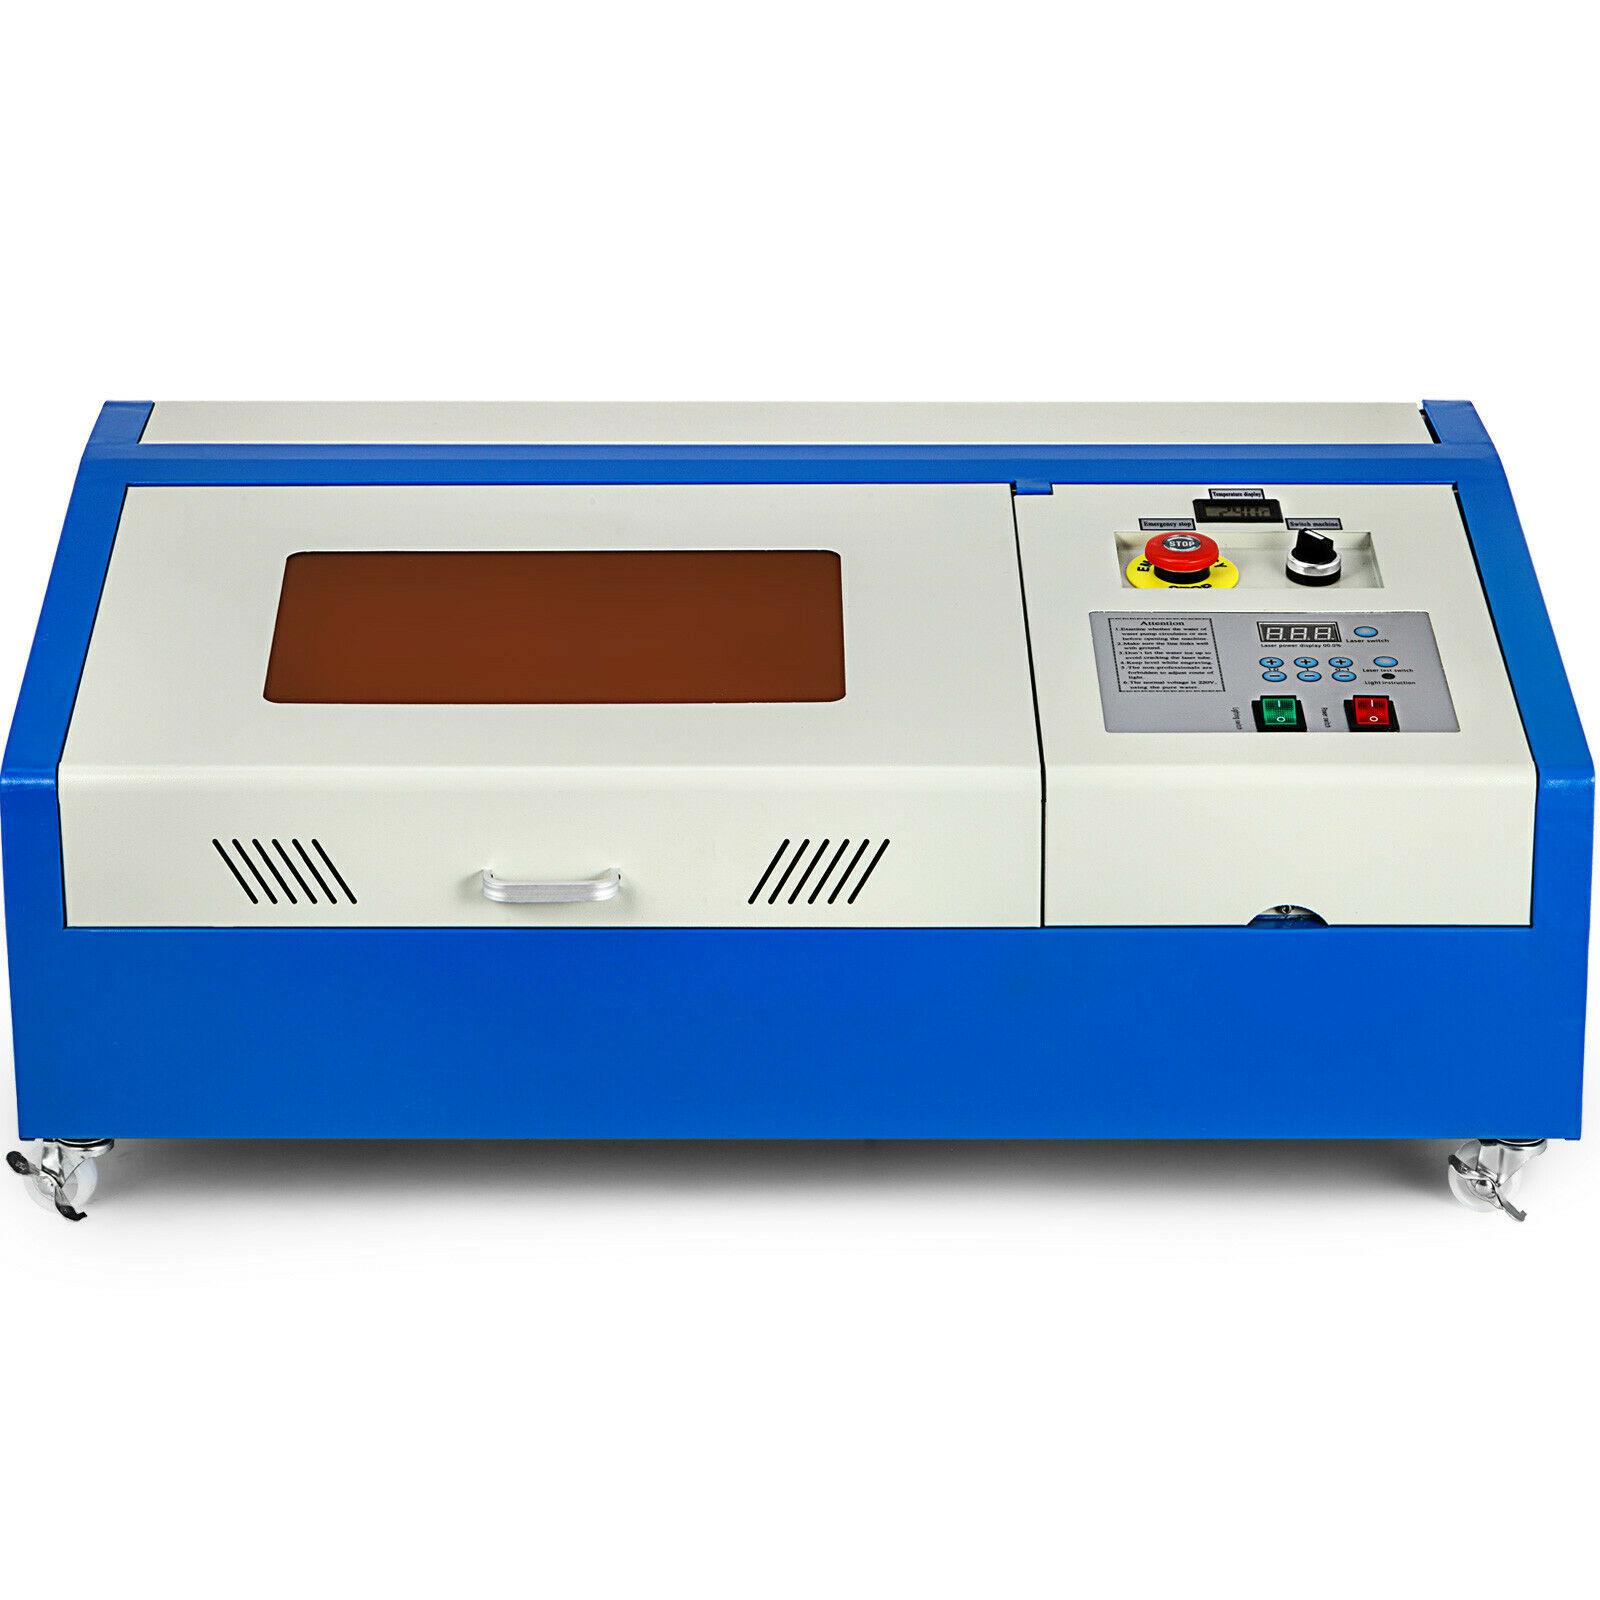 40W CO2 USB Laser Gravur Schneiden Maschine Graveur Holz Cutter